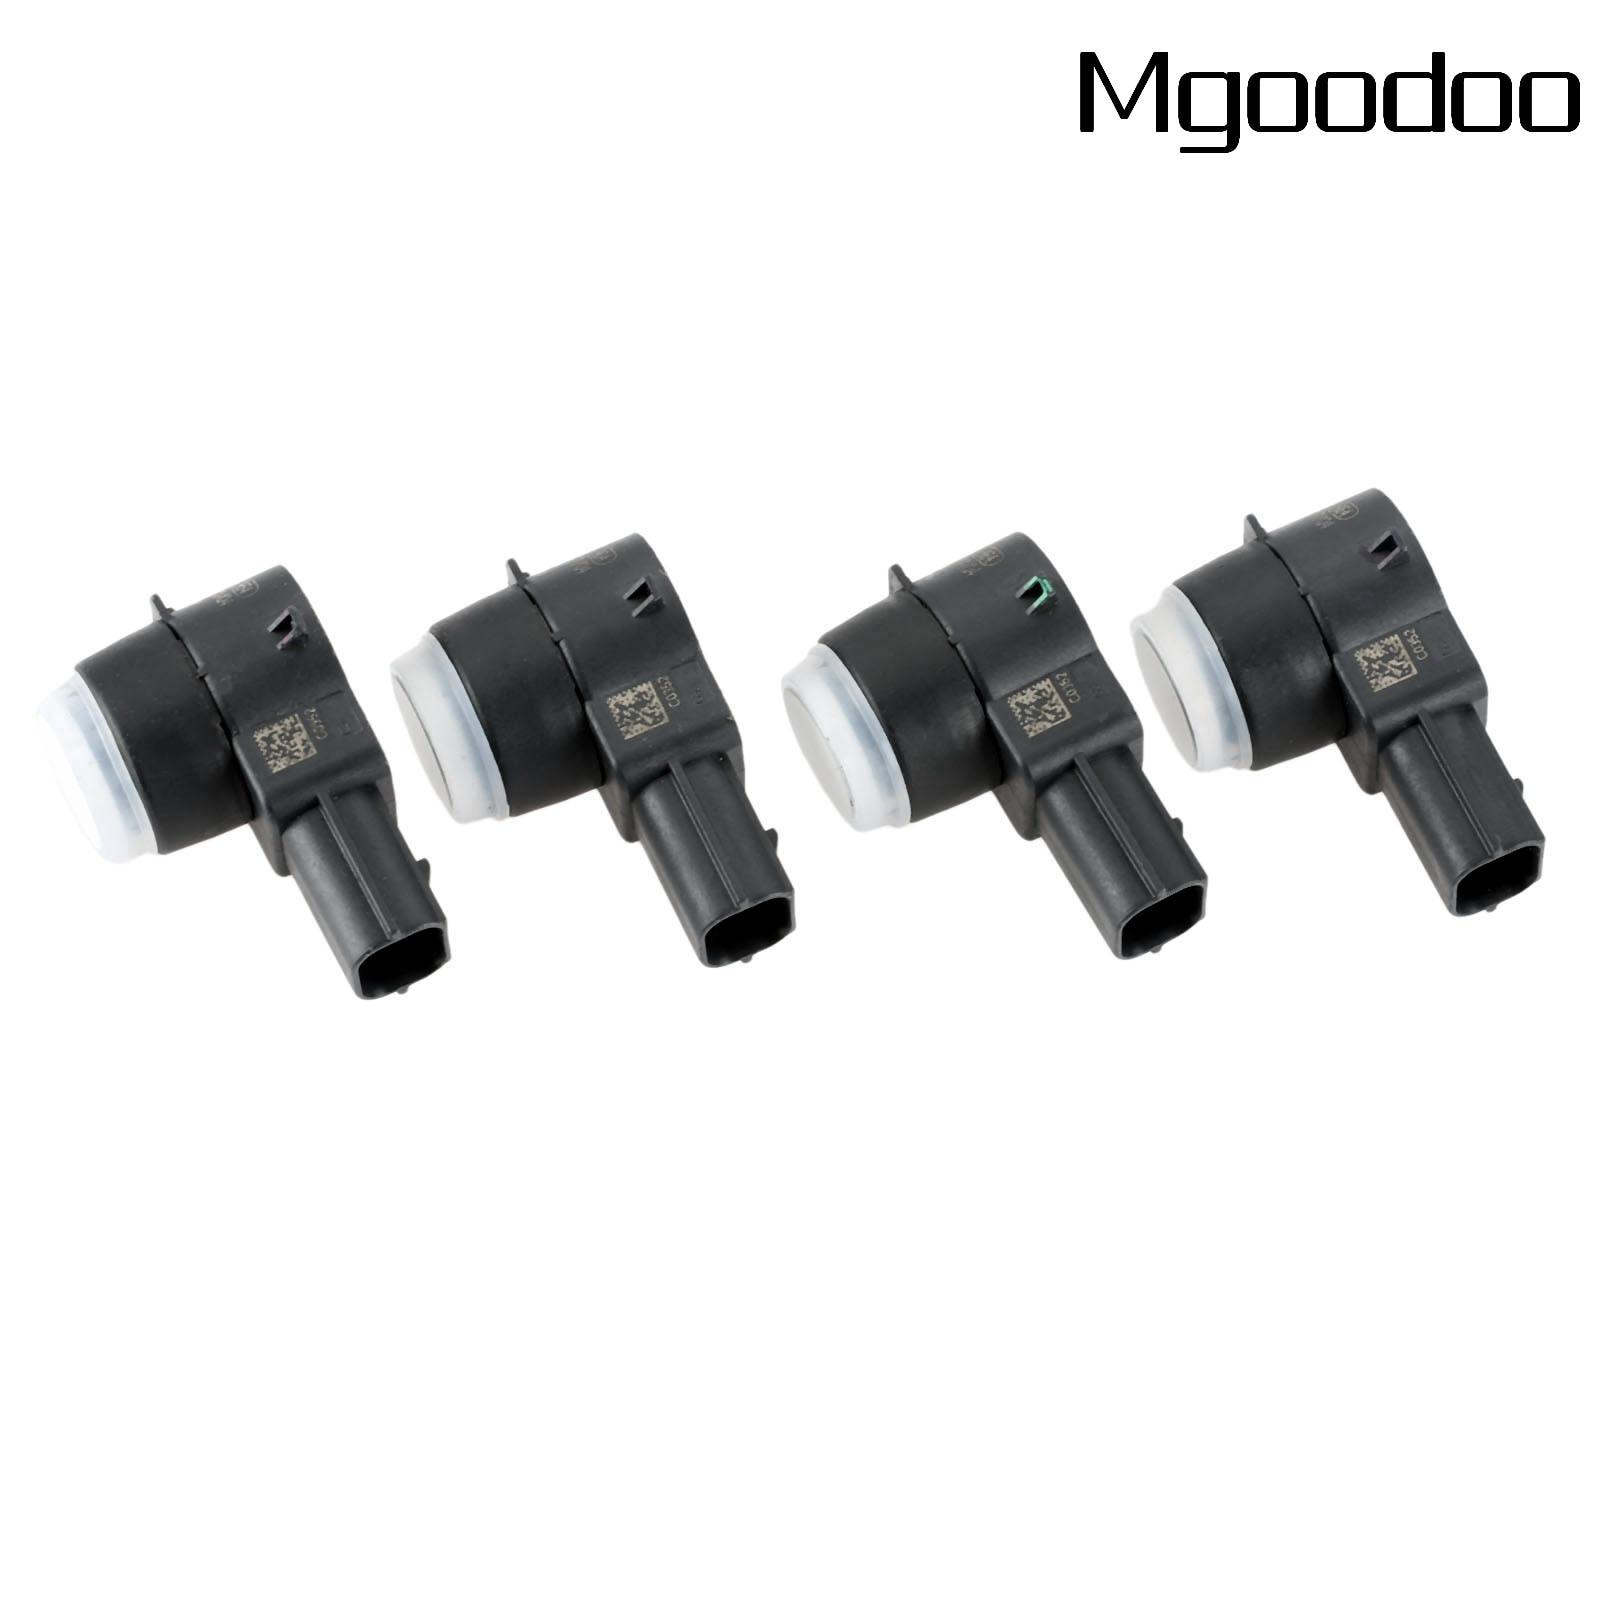 New 4x PDC Parking Distance Control Sensor Backup Reverse Assist Radar 21995588 0263003402 For G M Automobiles Packtronic Sensor